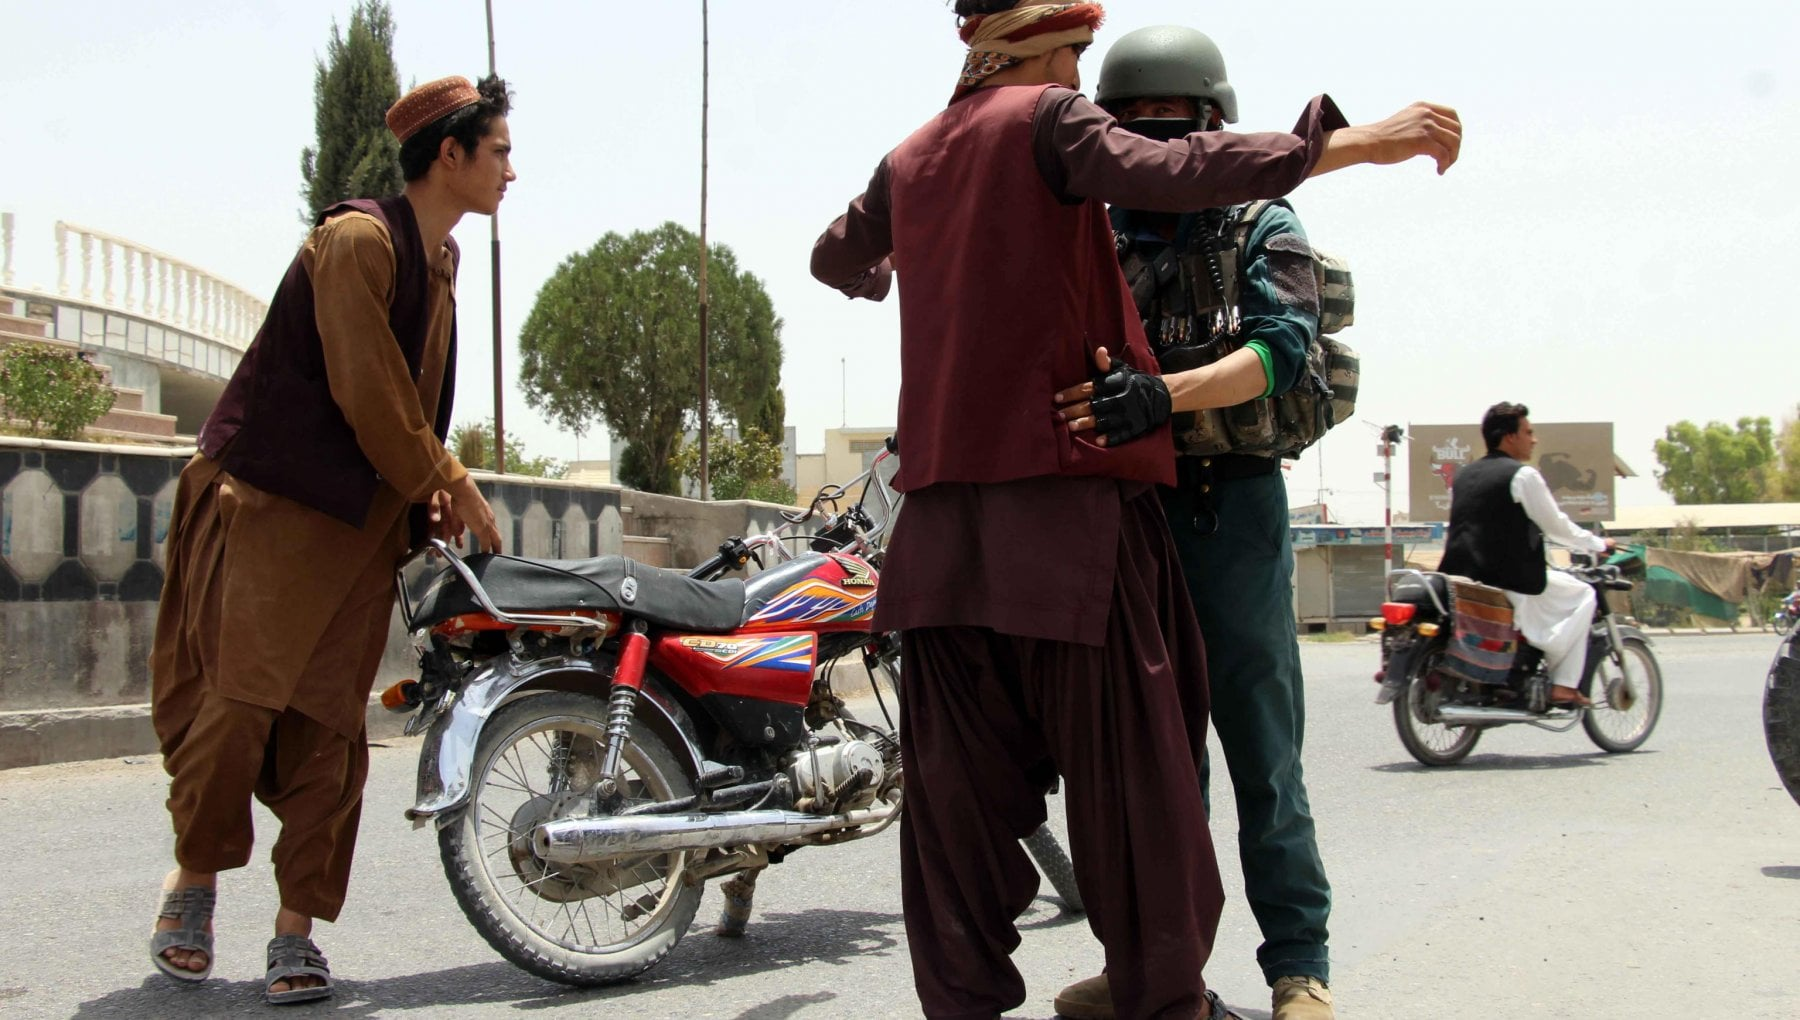 215525402 15d31833 9038 4a90 8753 5125aa5cd8f8 - Fuga dall'Afghanistan, più di 30mila scappano ogni settimana dai talebani